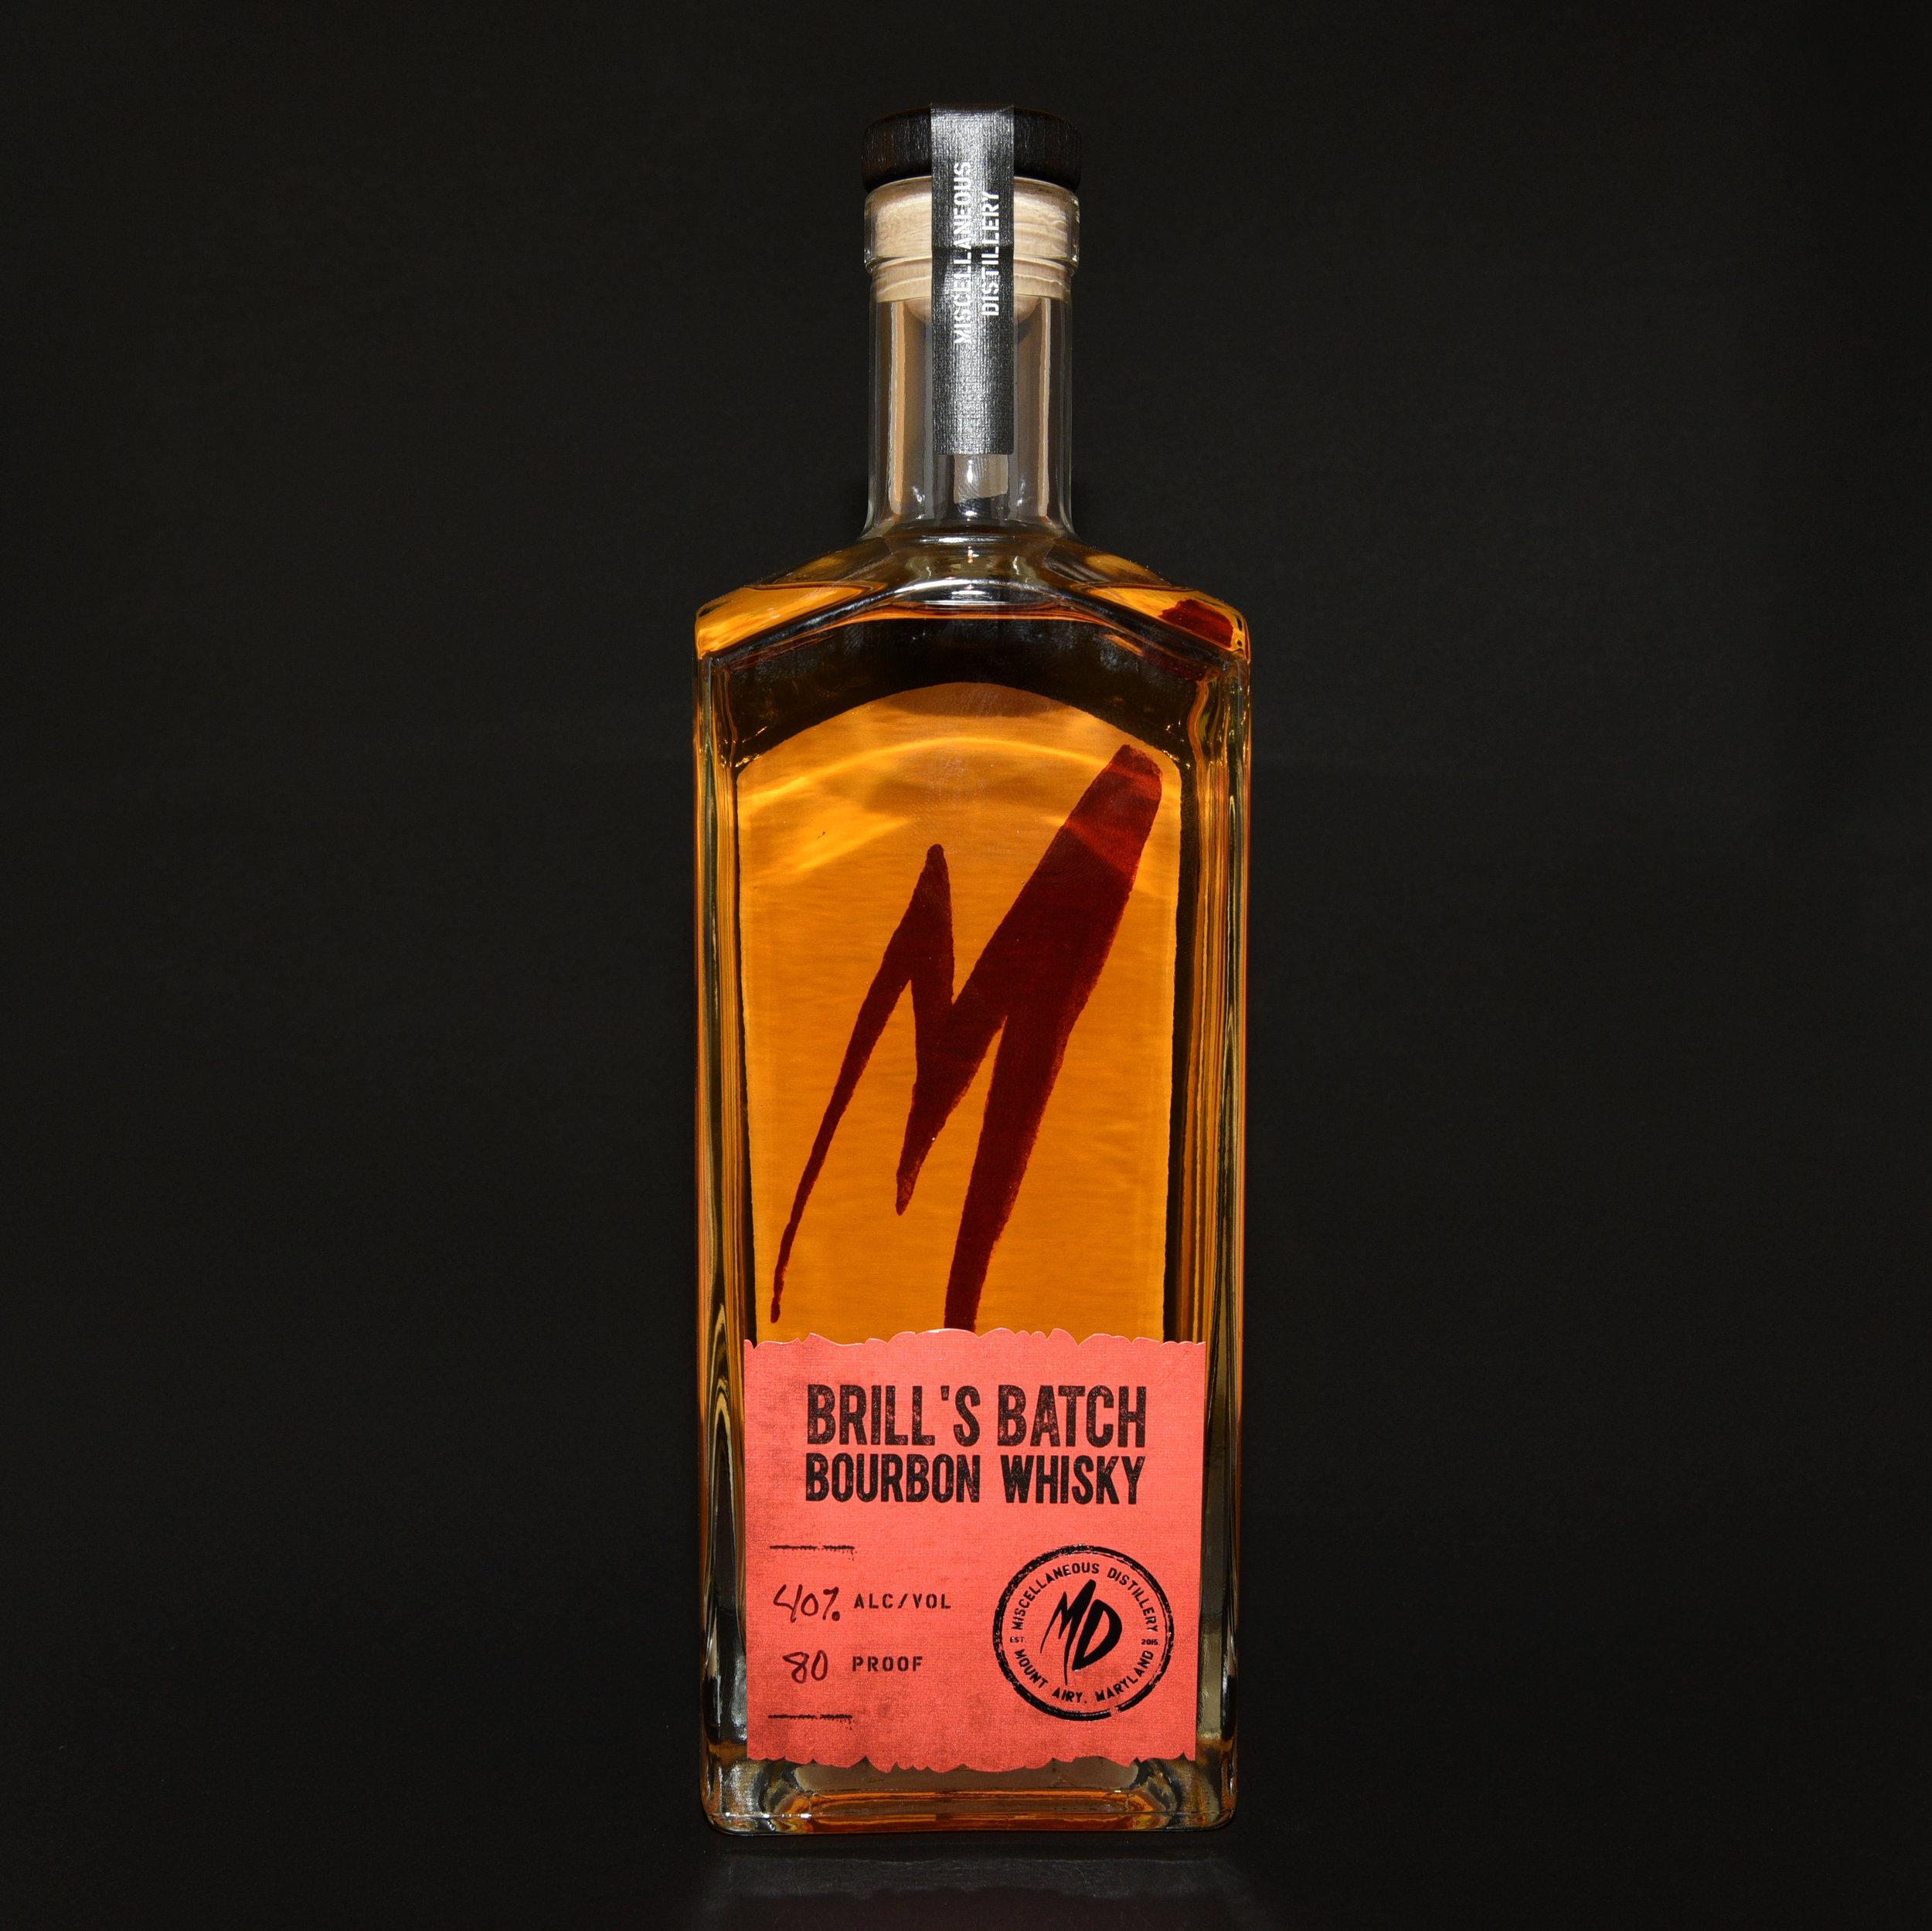 MISC_Brills Batch bourbon whisky_black_bgkd.jpg